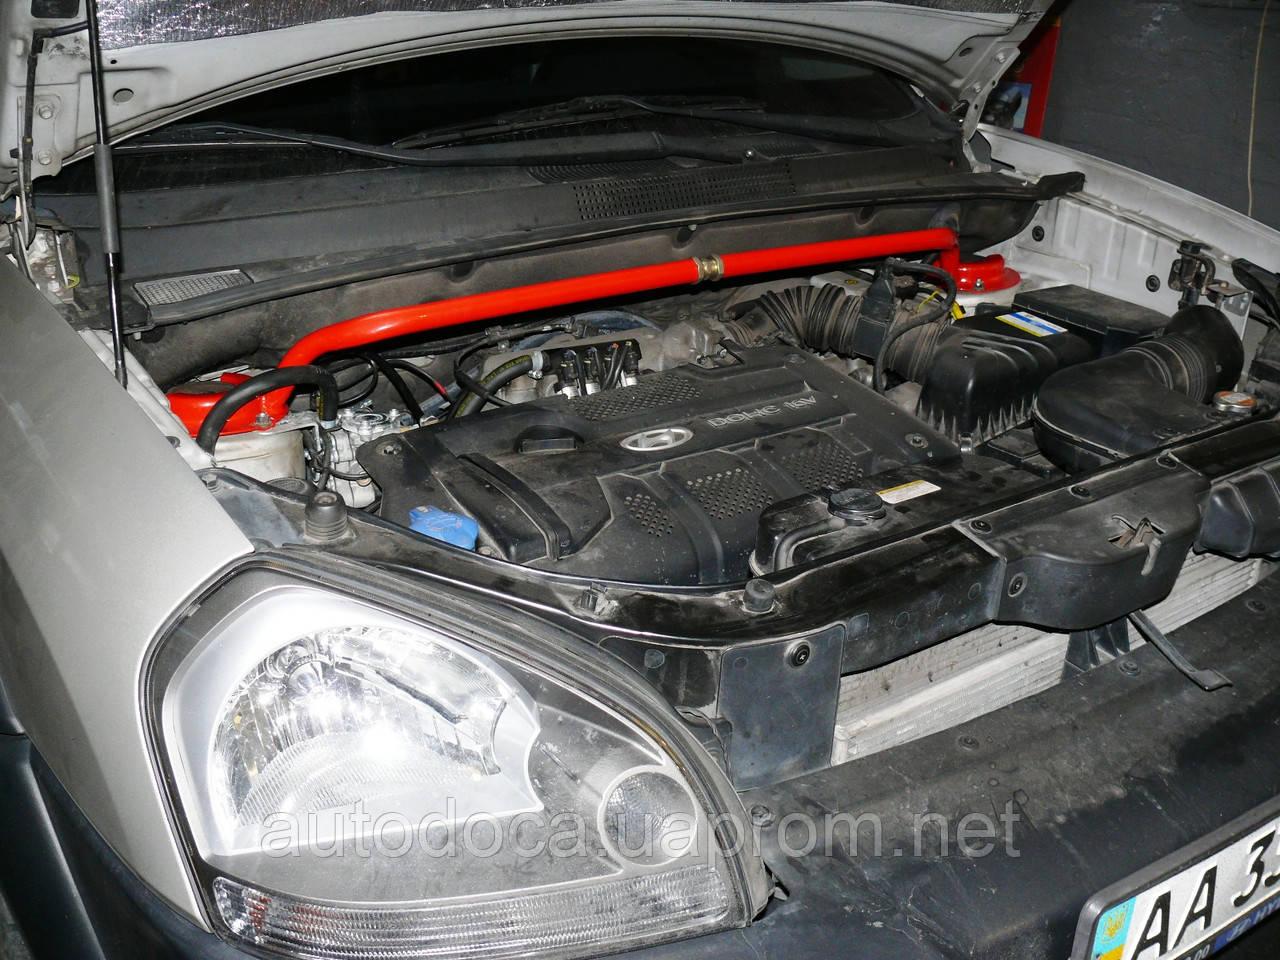 Распорка передних стоек Hyundai Tucson